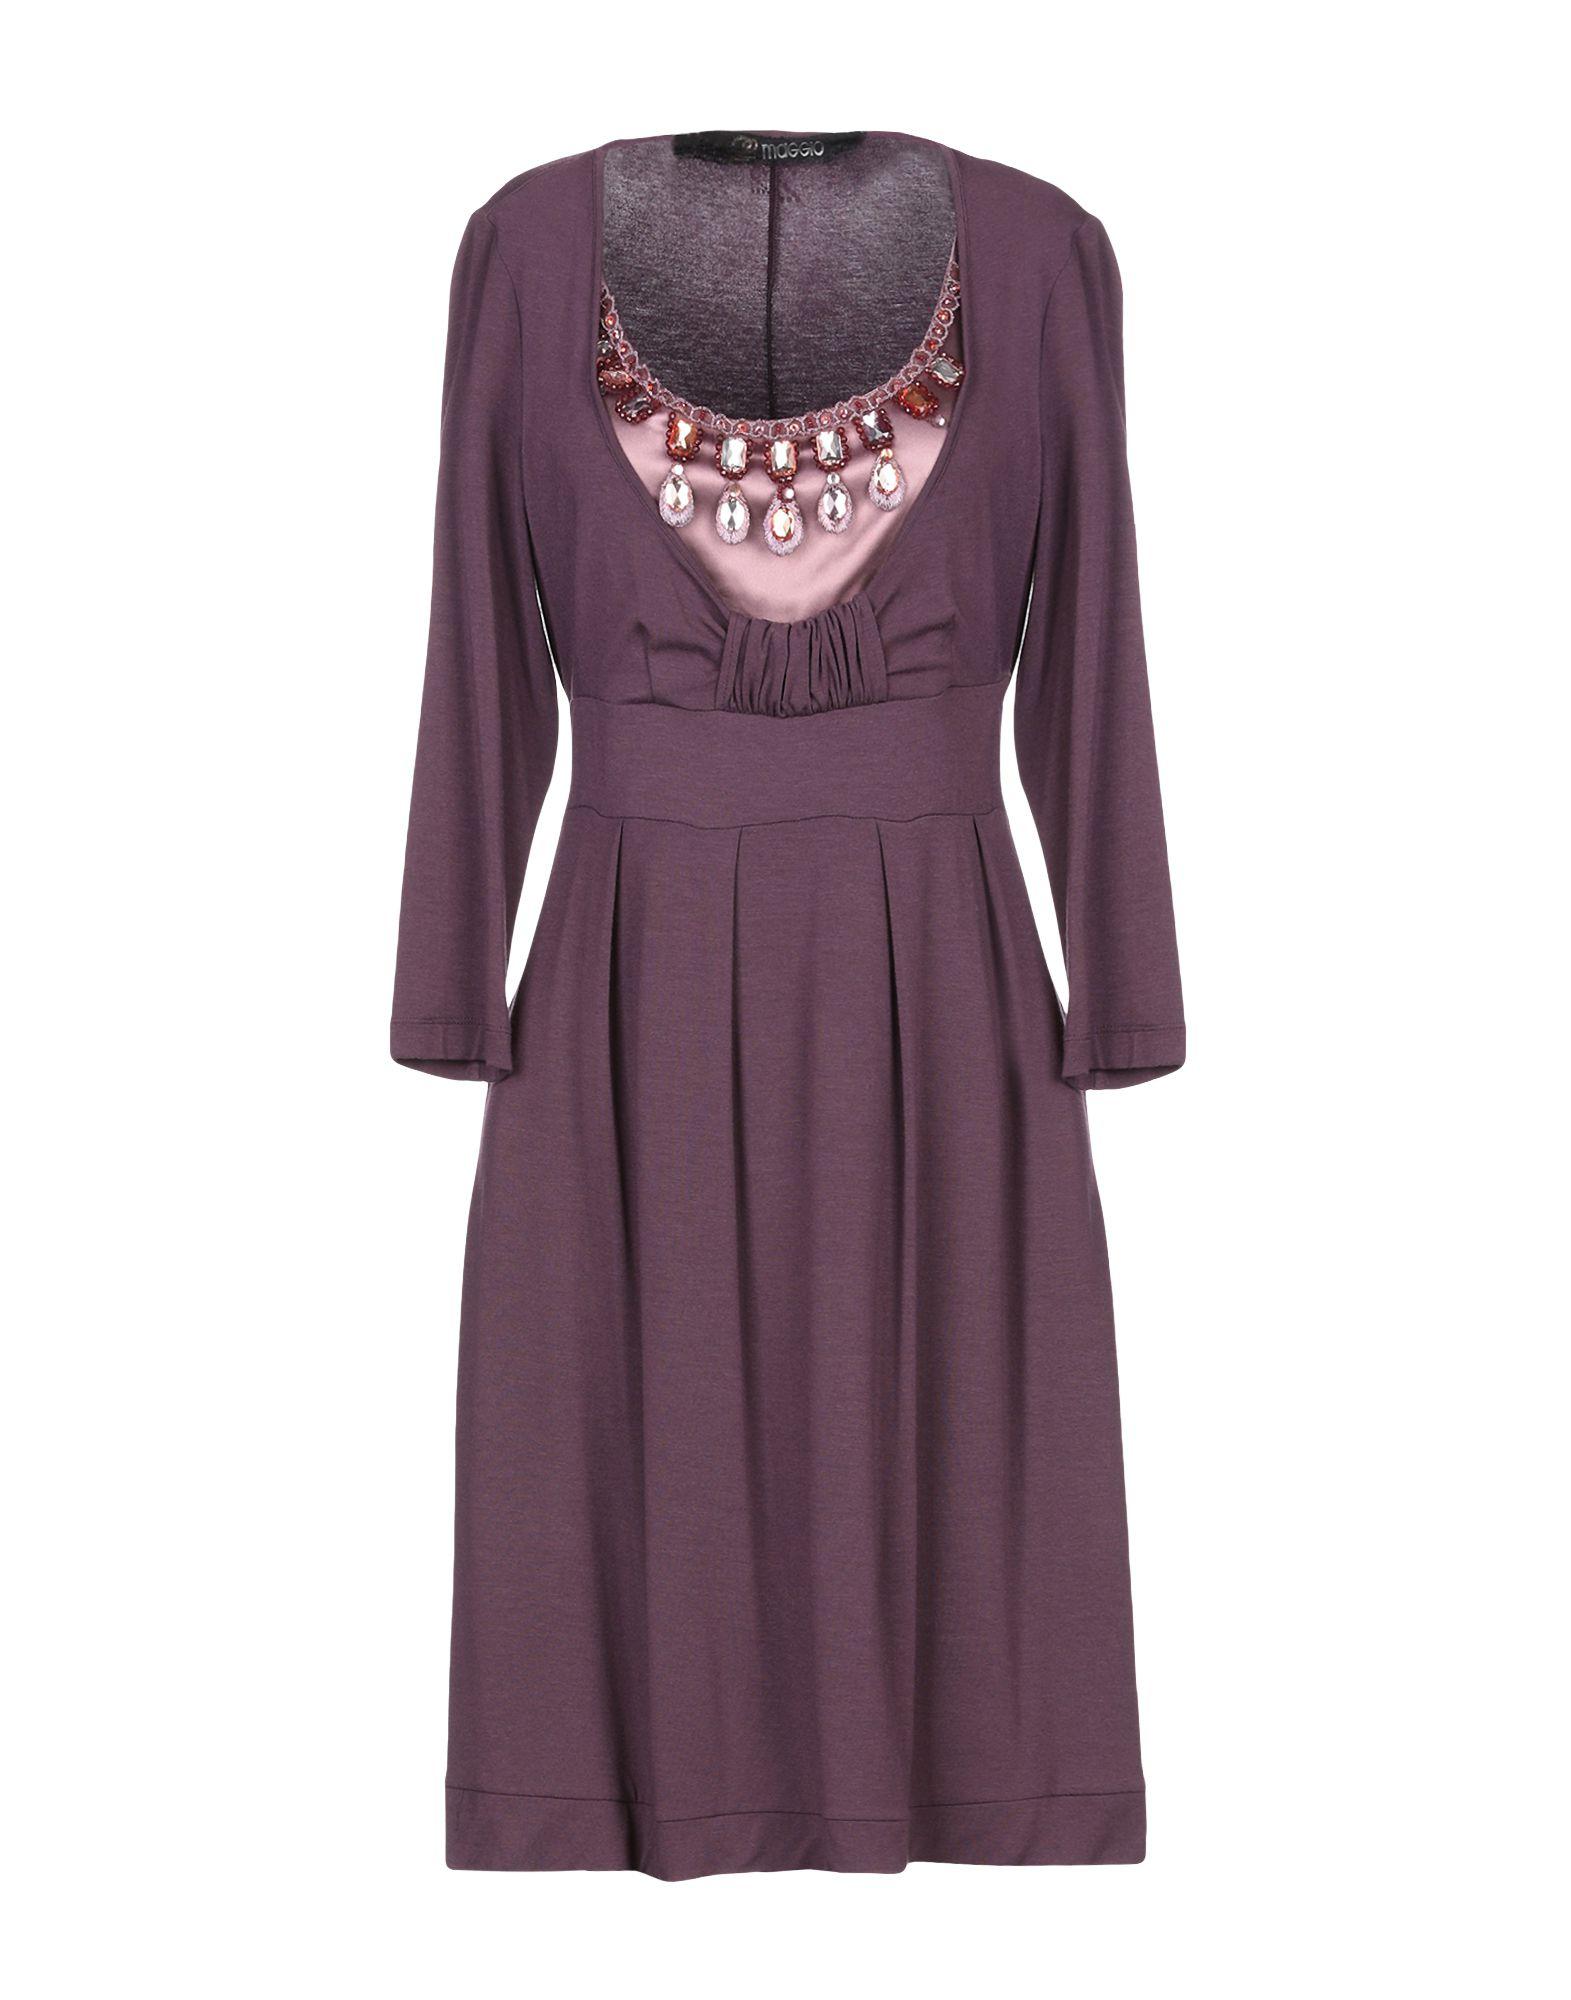 22 MAGGIO by MARIA GRAZIA SEVERI Короткое платье свободное платье с гипюром 22 maggio